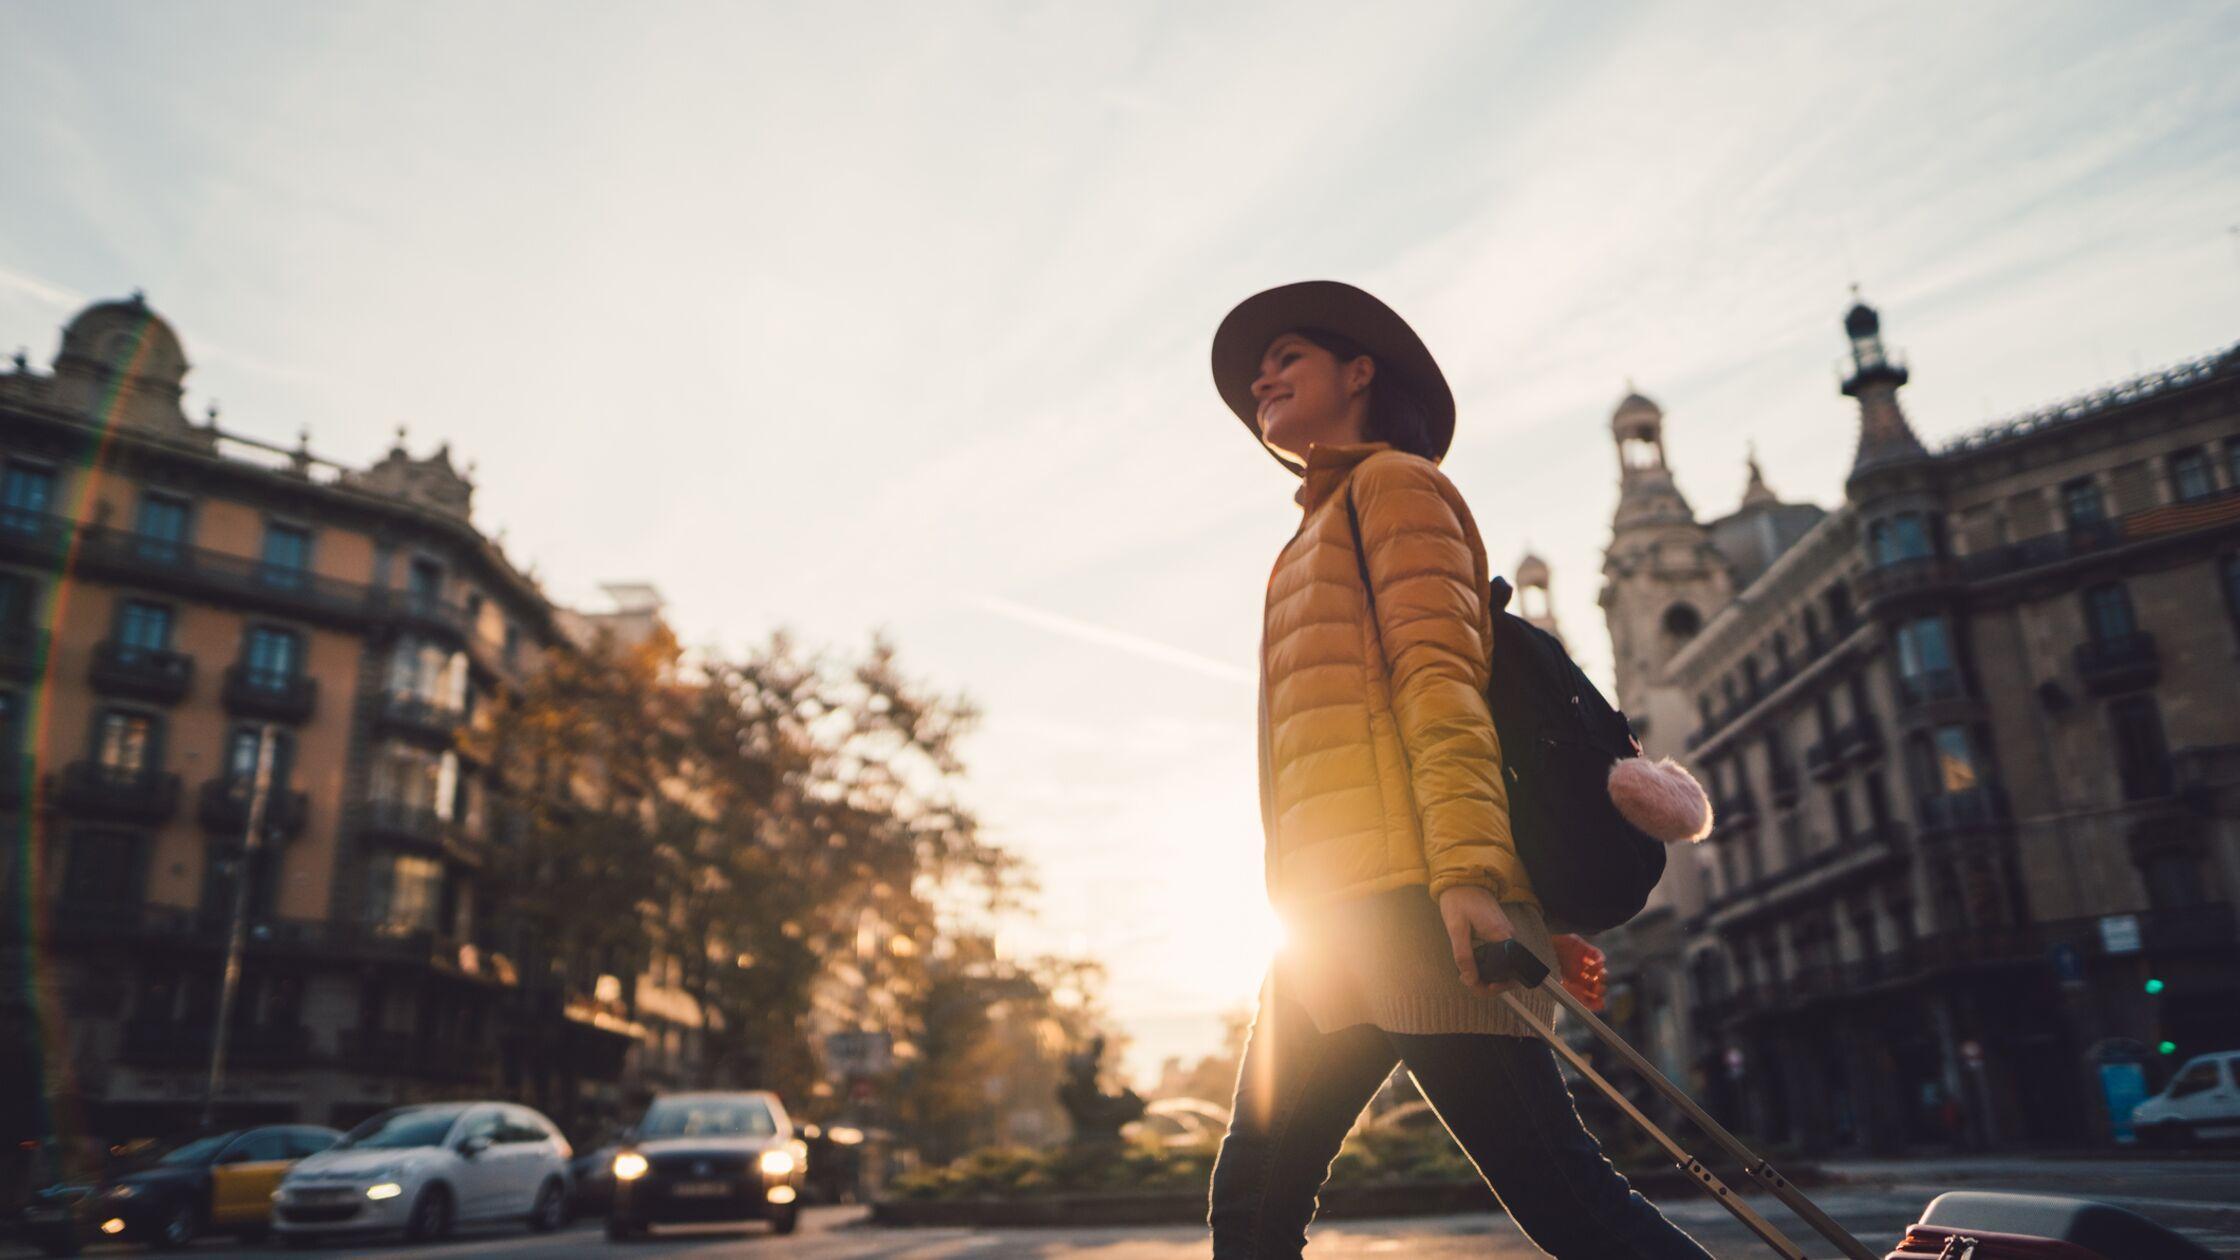 Frau zieht mit Koffer freudig ins Ausland